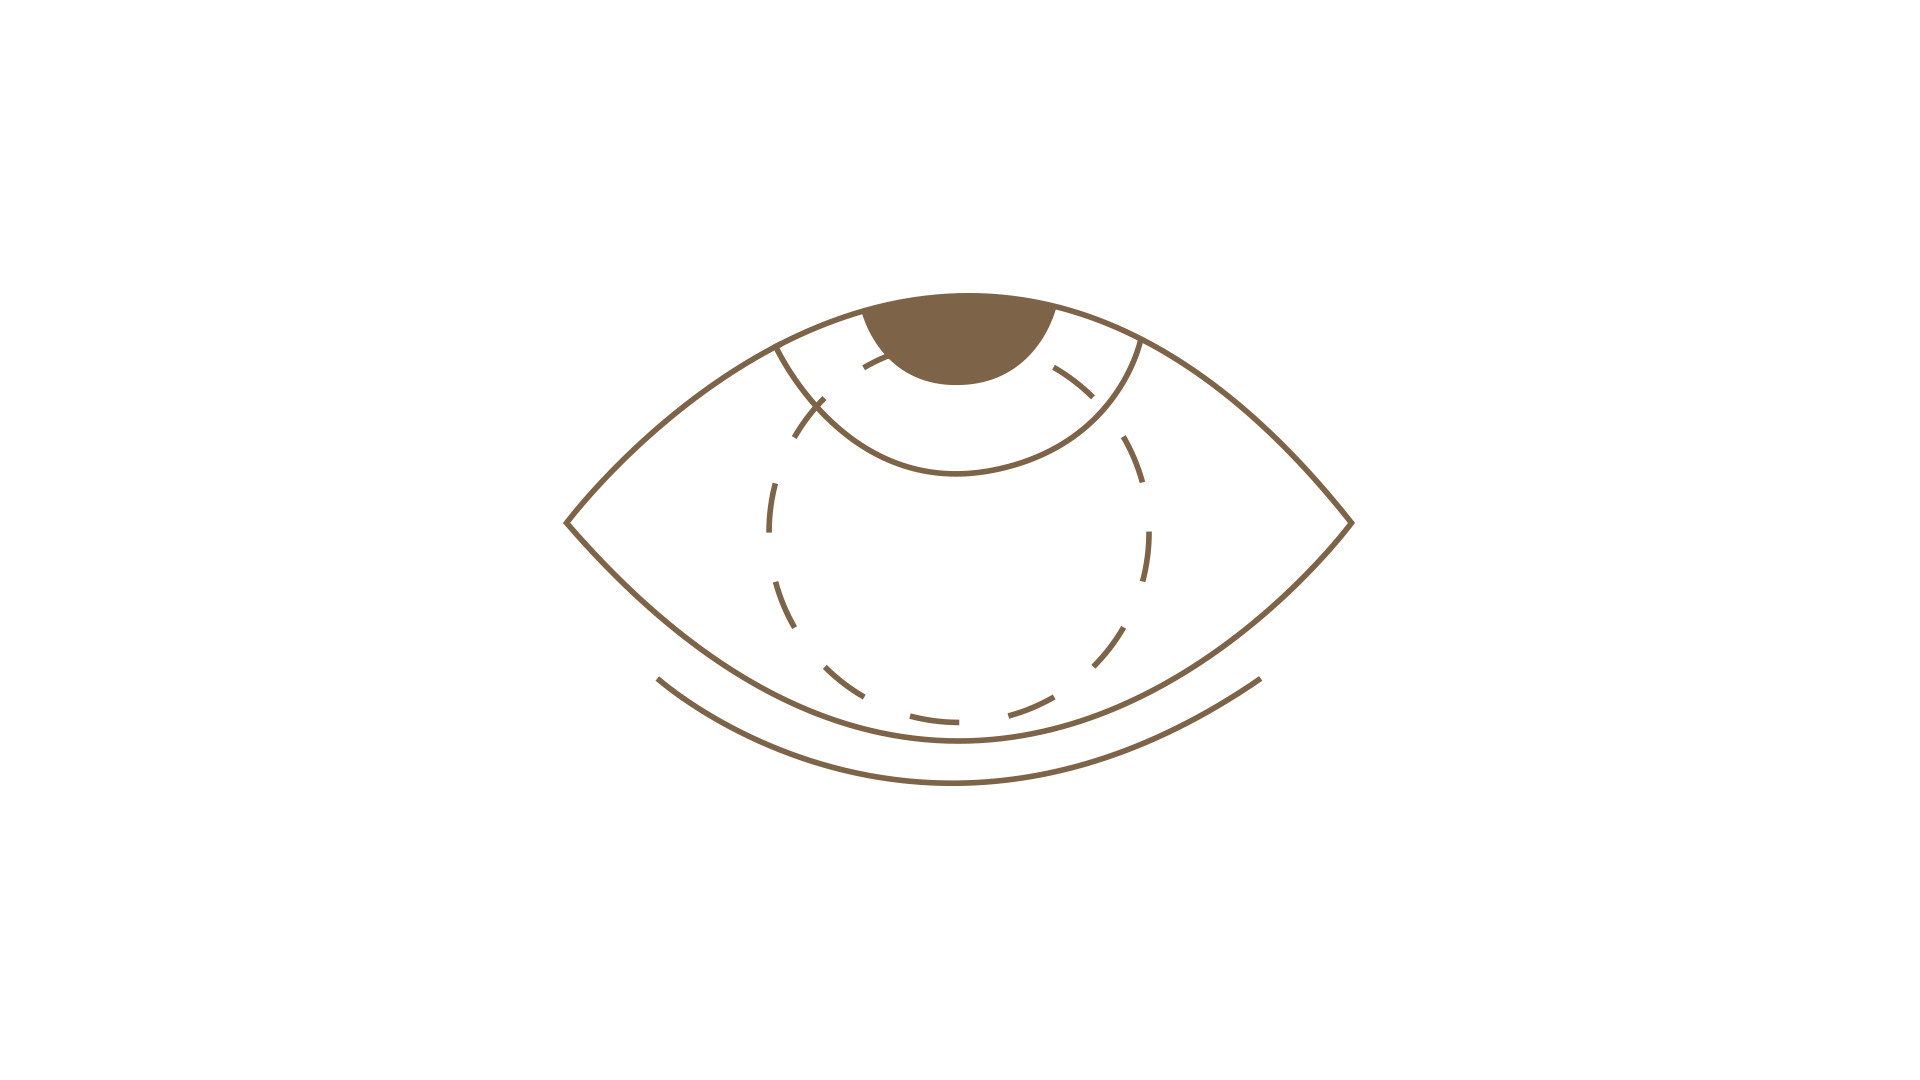 access-optic-utilisation-002